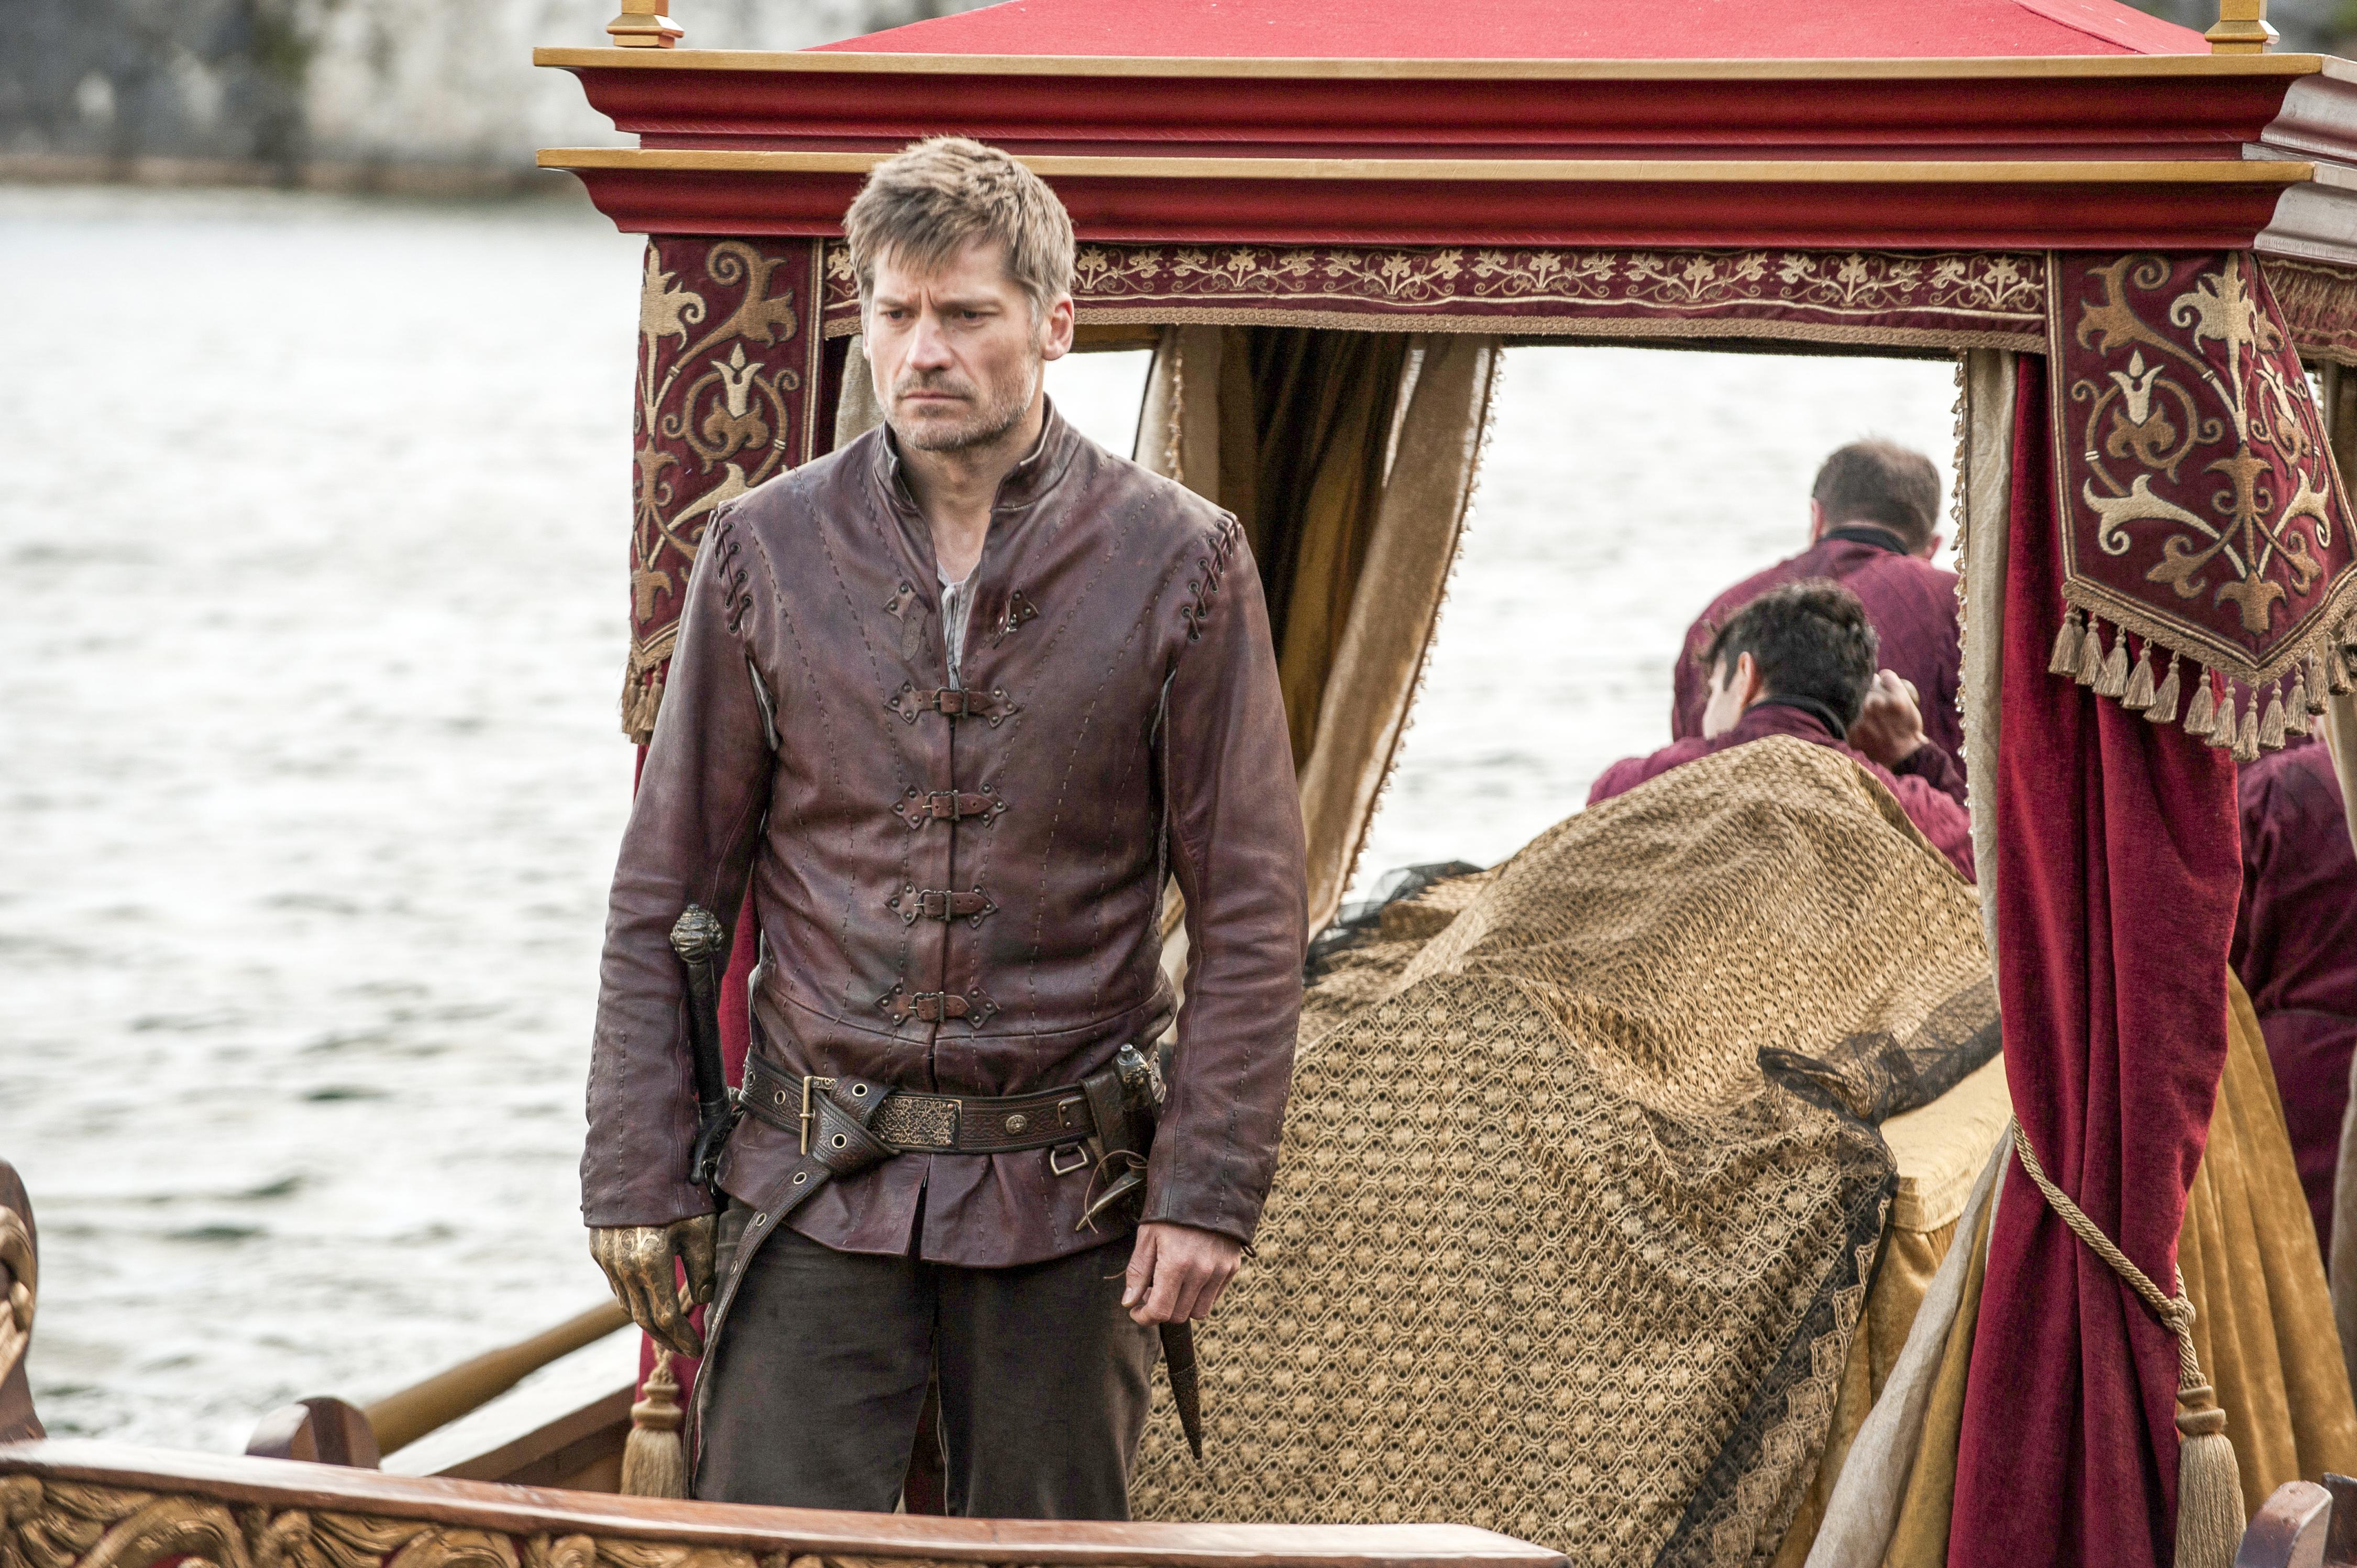 Nikolaj Coster-Waldau as Jaime Lannister. Photo by Helen Sloan/HBO